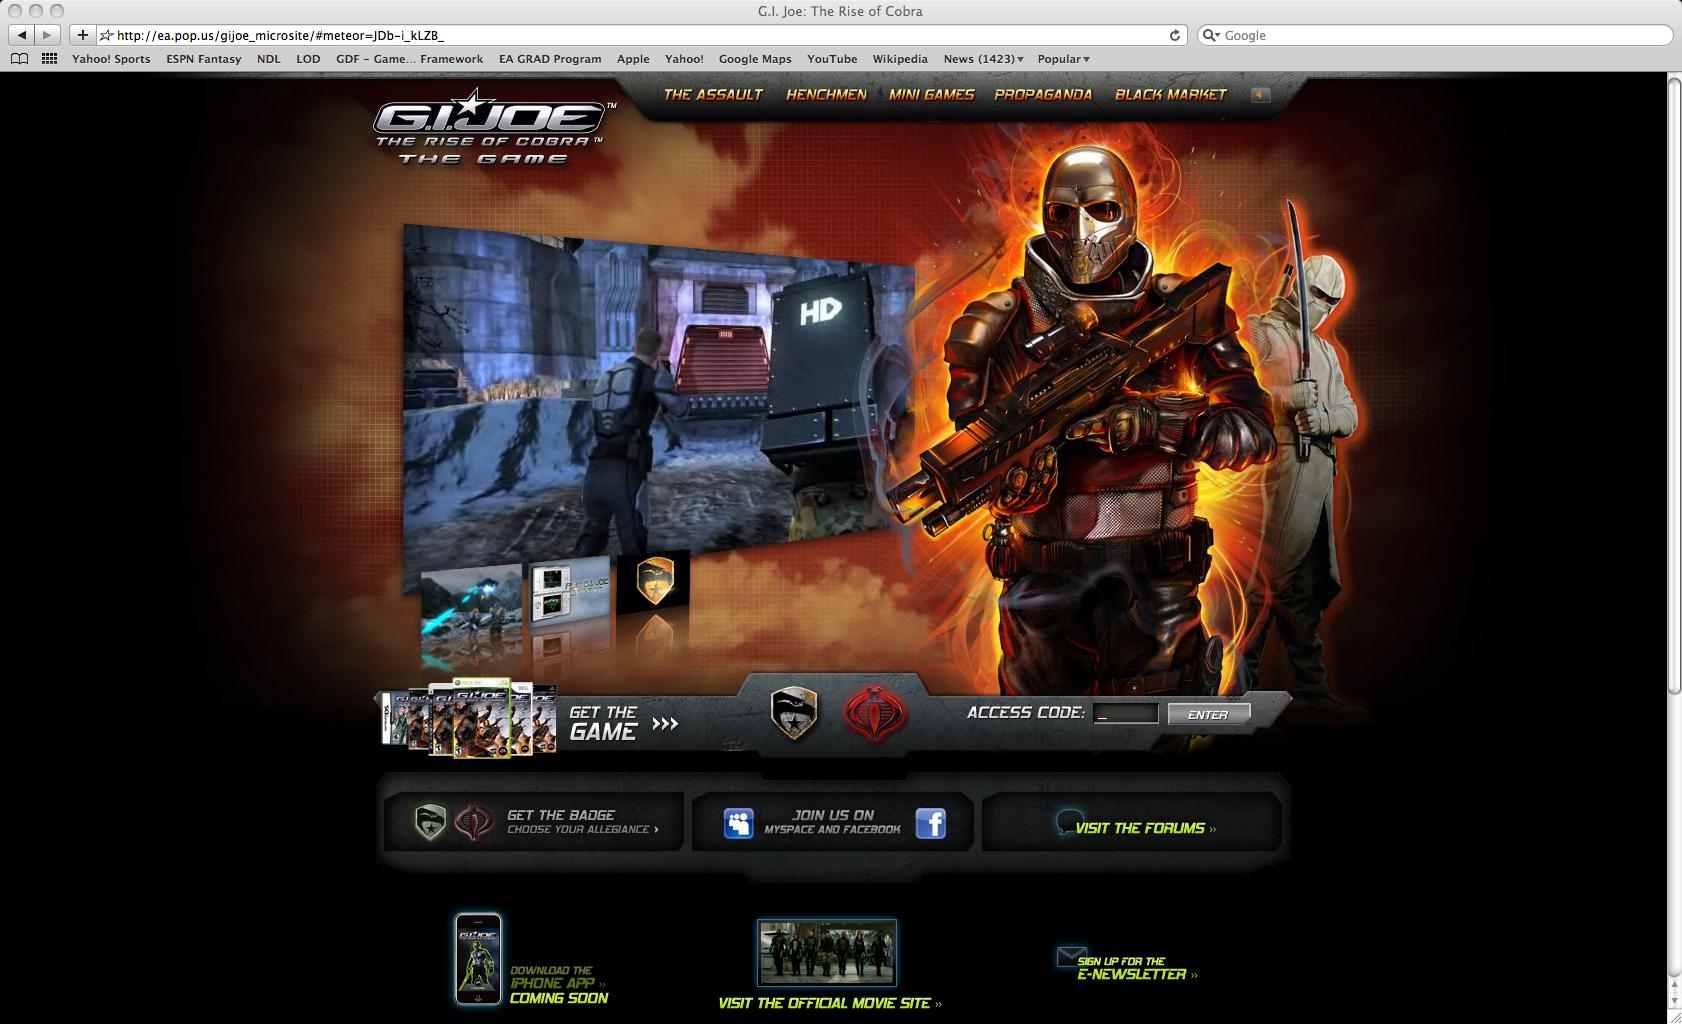 website-cobra_landing_page_tiff_jpgcopy.jpg